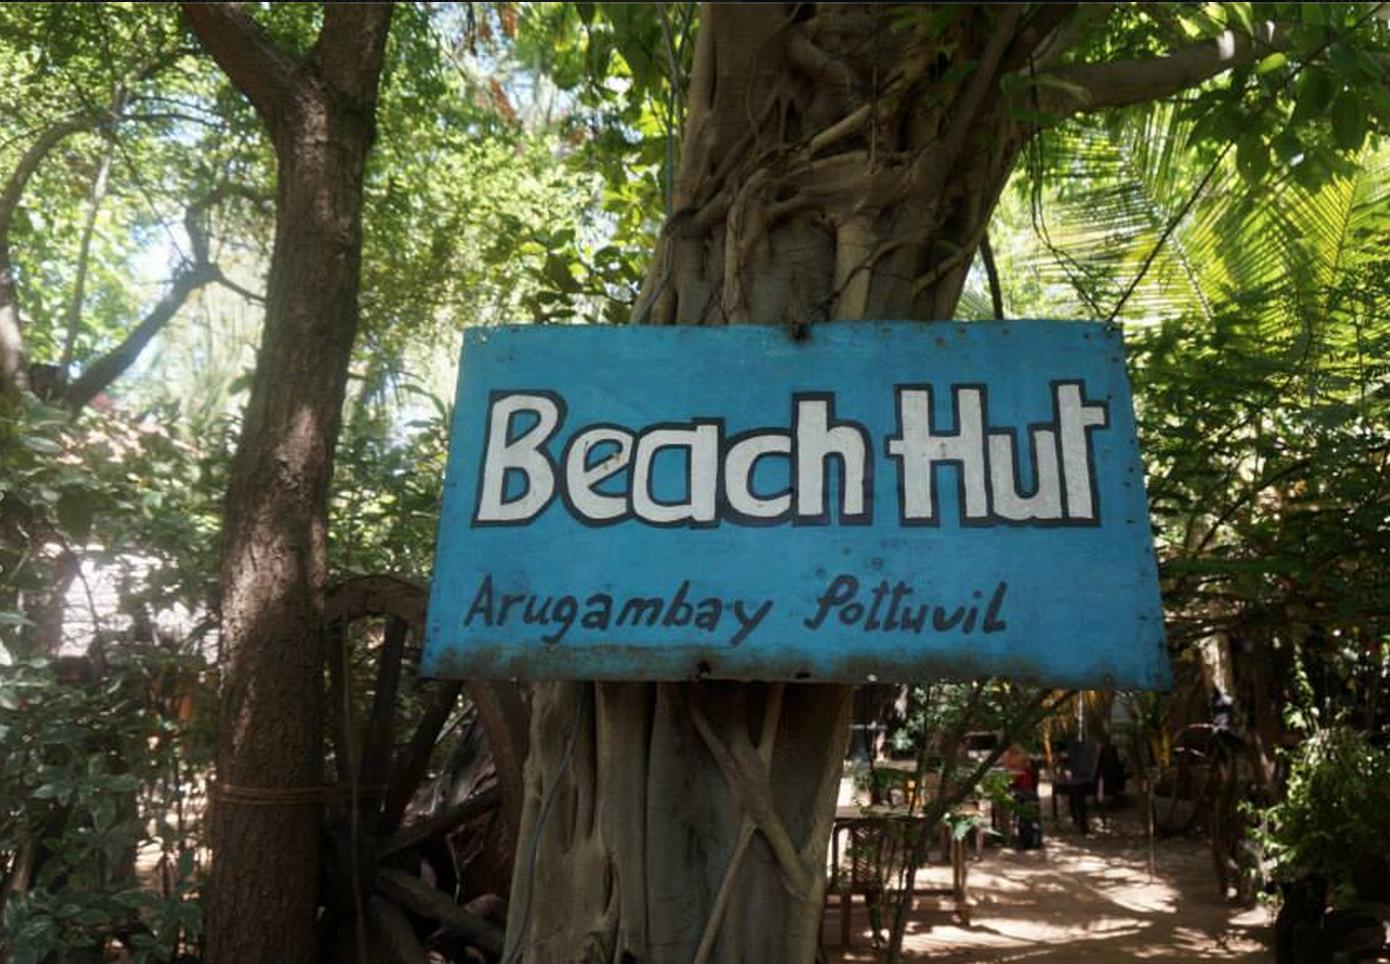 Beach hut sri lanka